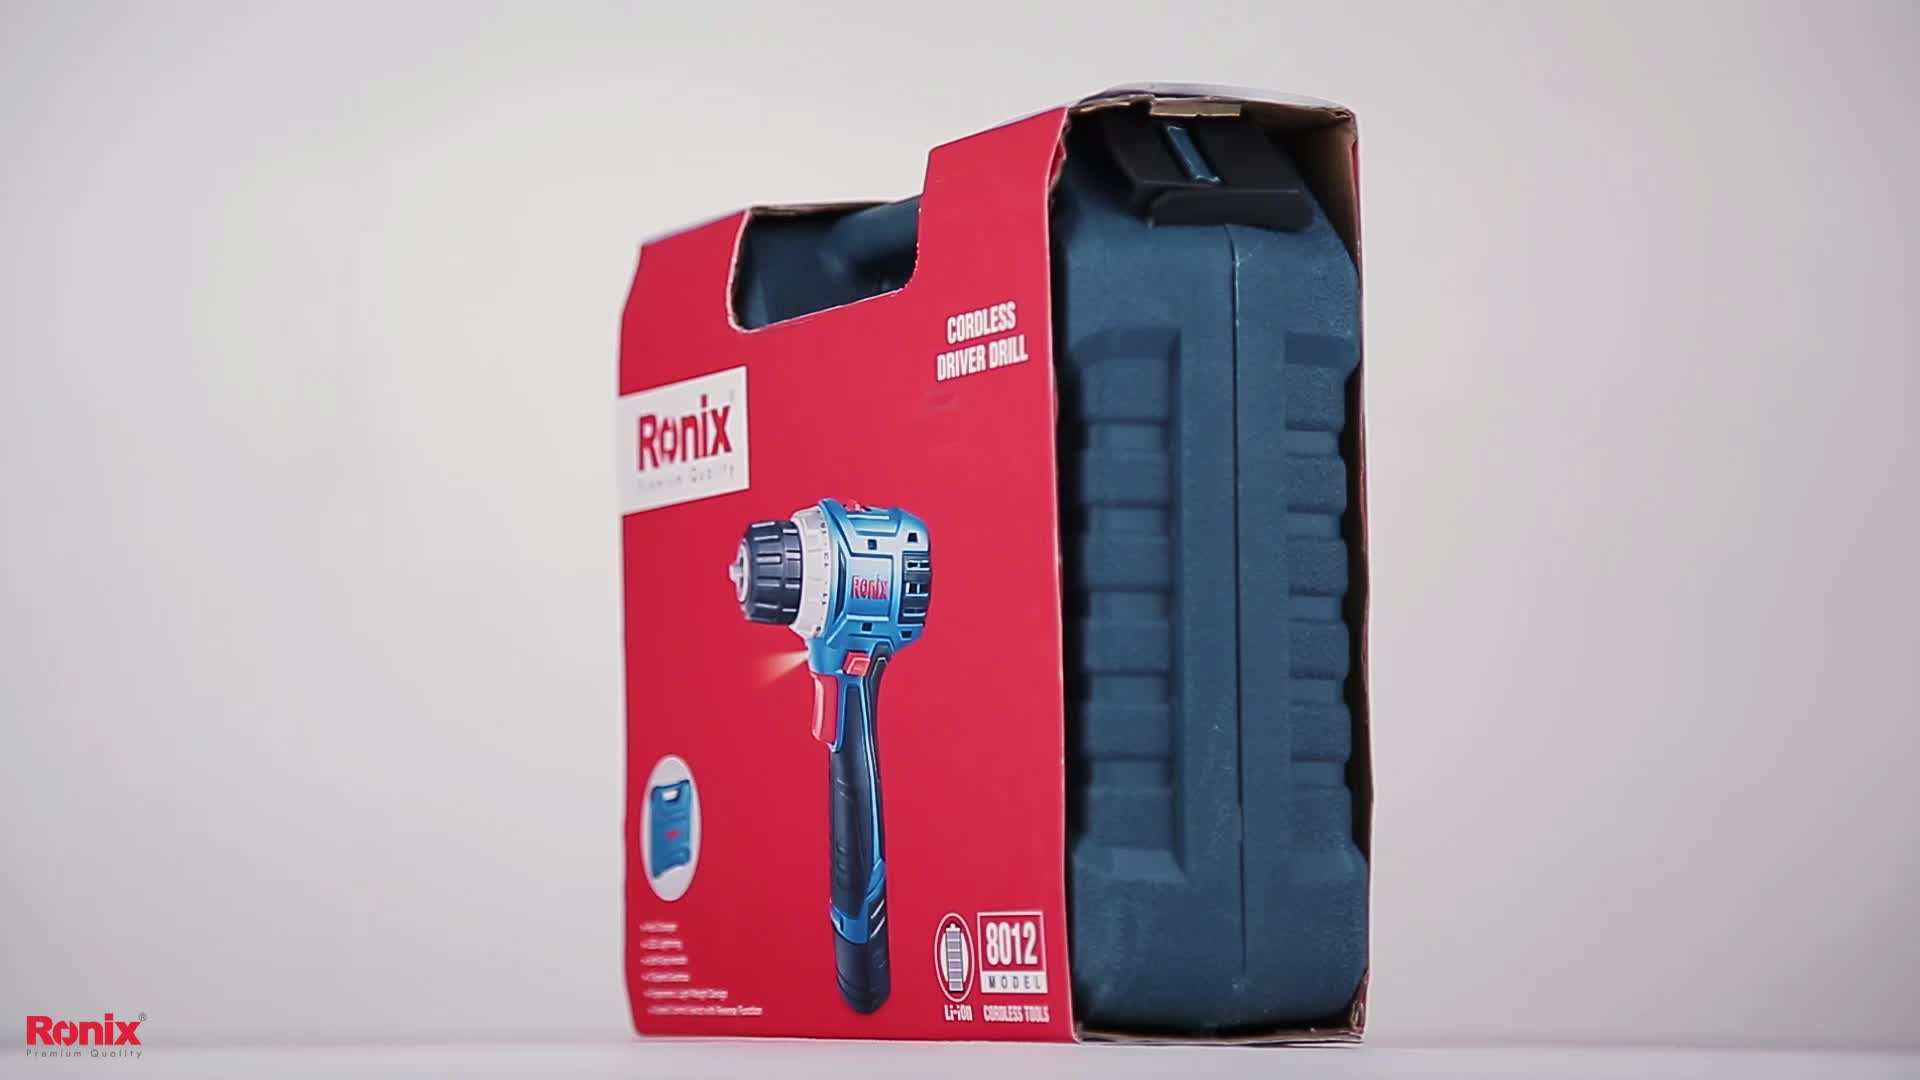 Ronix Power Tool Li-ion Brushless Power Driver Drill 12V Cordless Screwdriver Tools Model 8012C